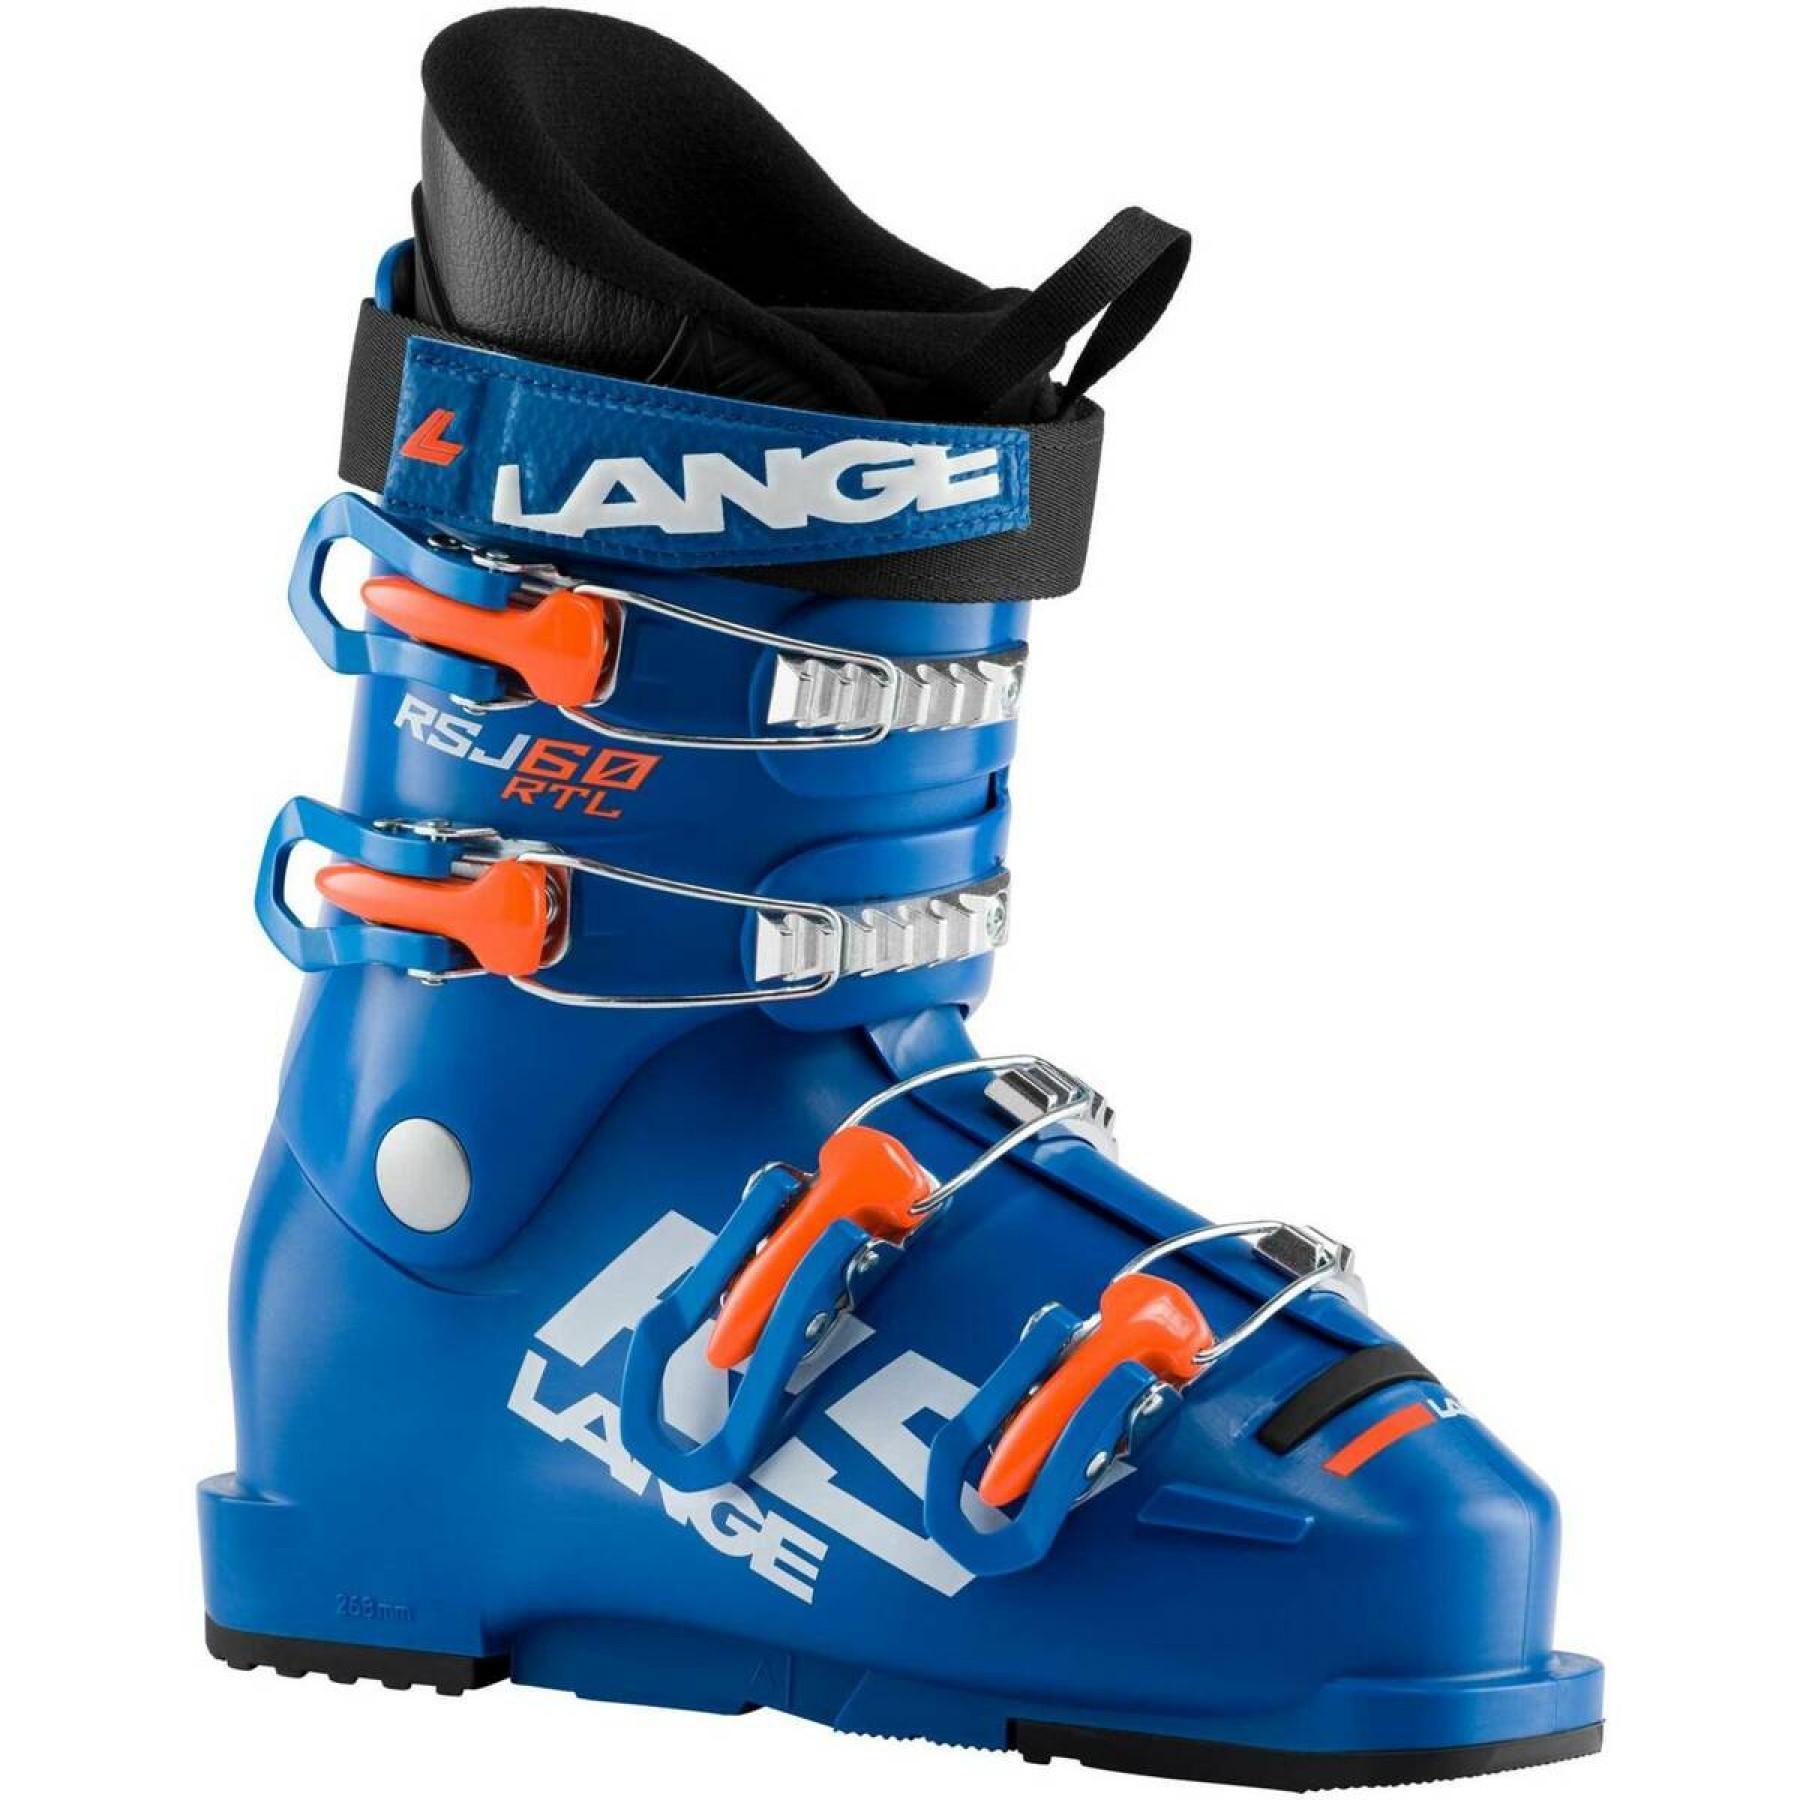 Children ski boots Lange rsj 60 rtl